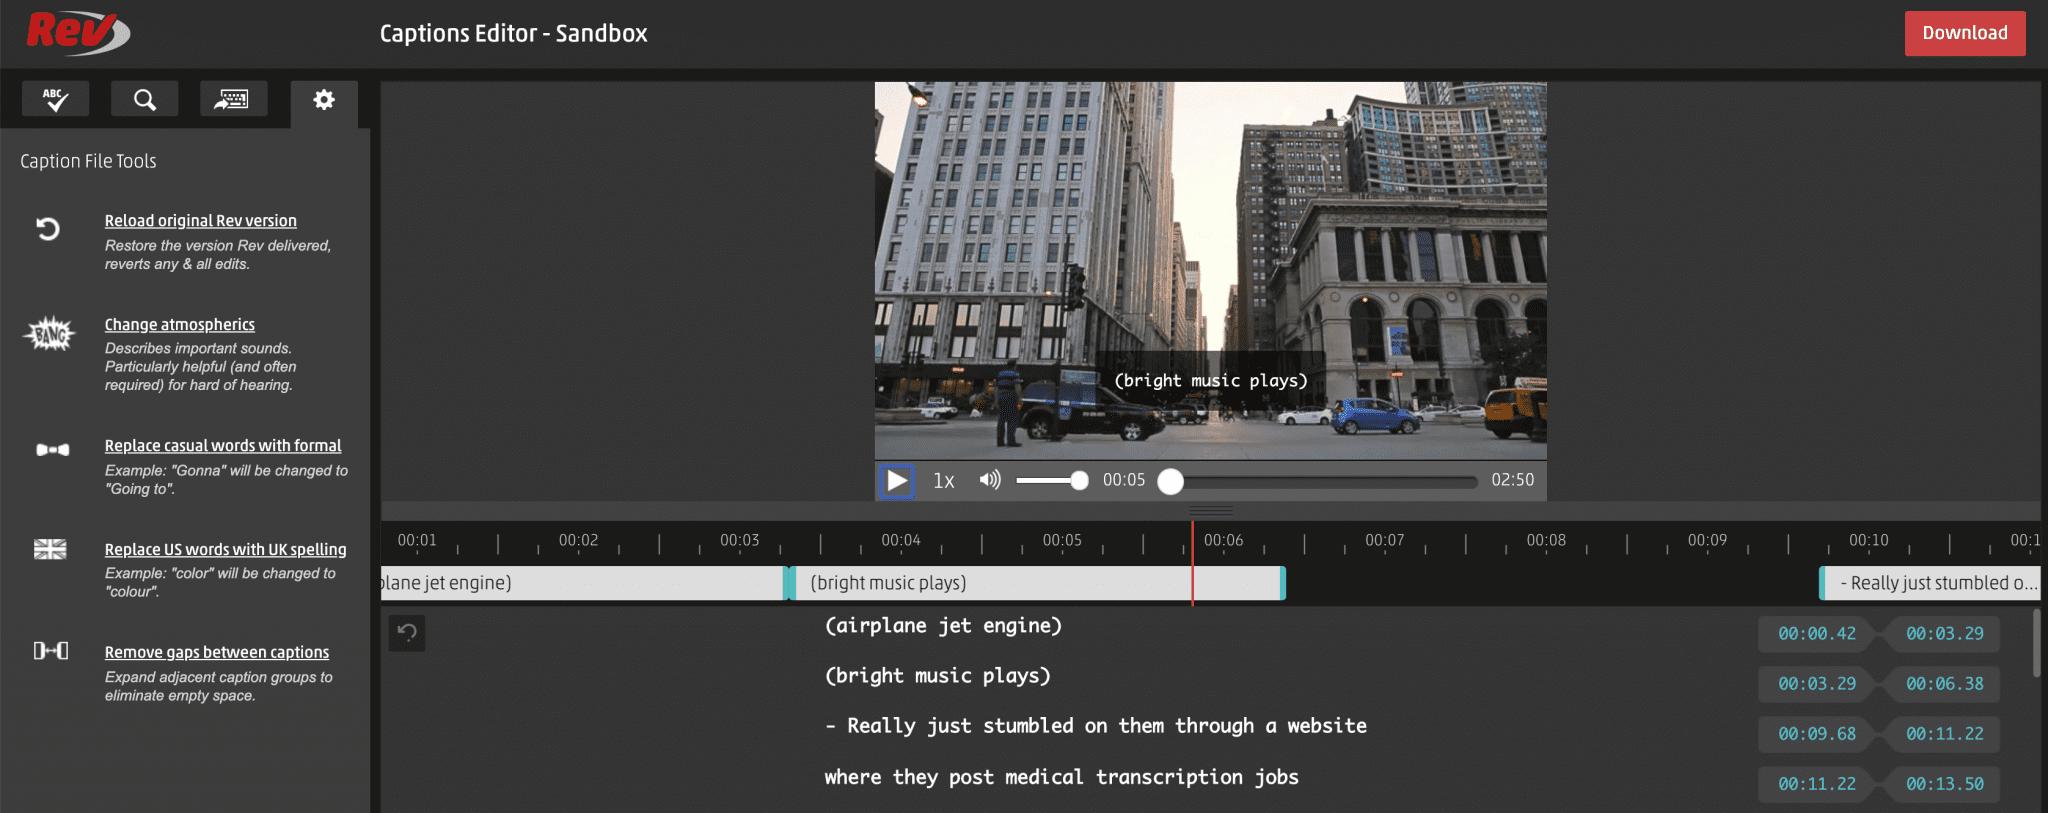 how to transcribe zoom videos, rev captions sandbox editor